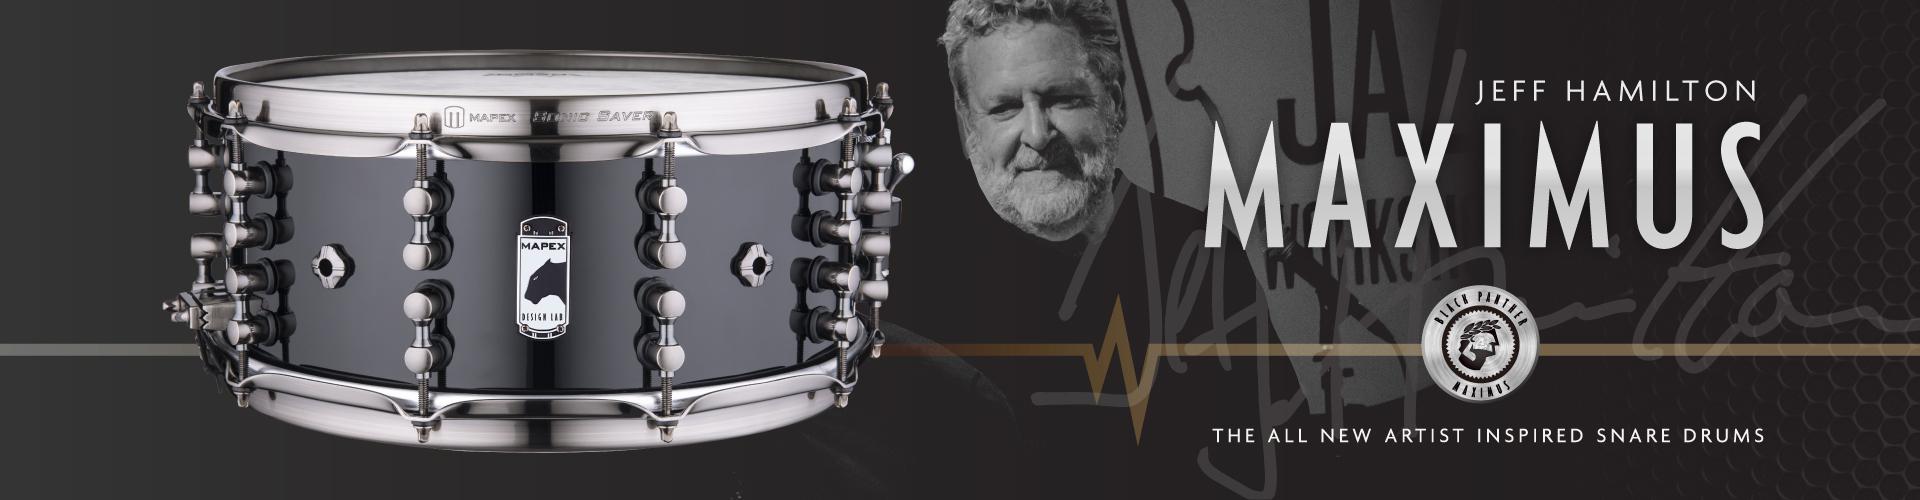 Maximus - Jeff Hamilton Artist Snare